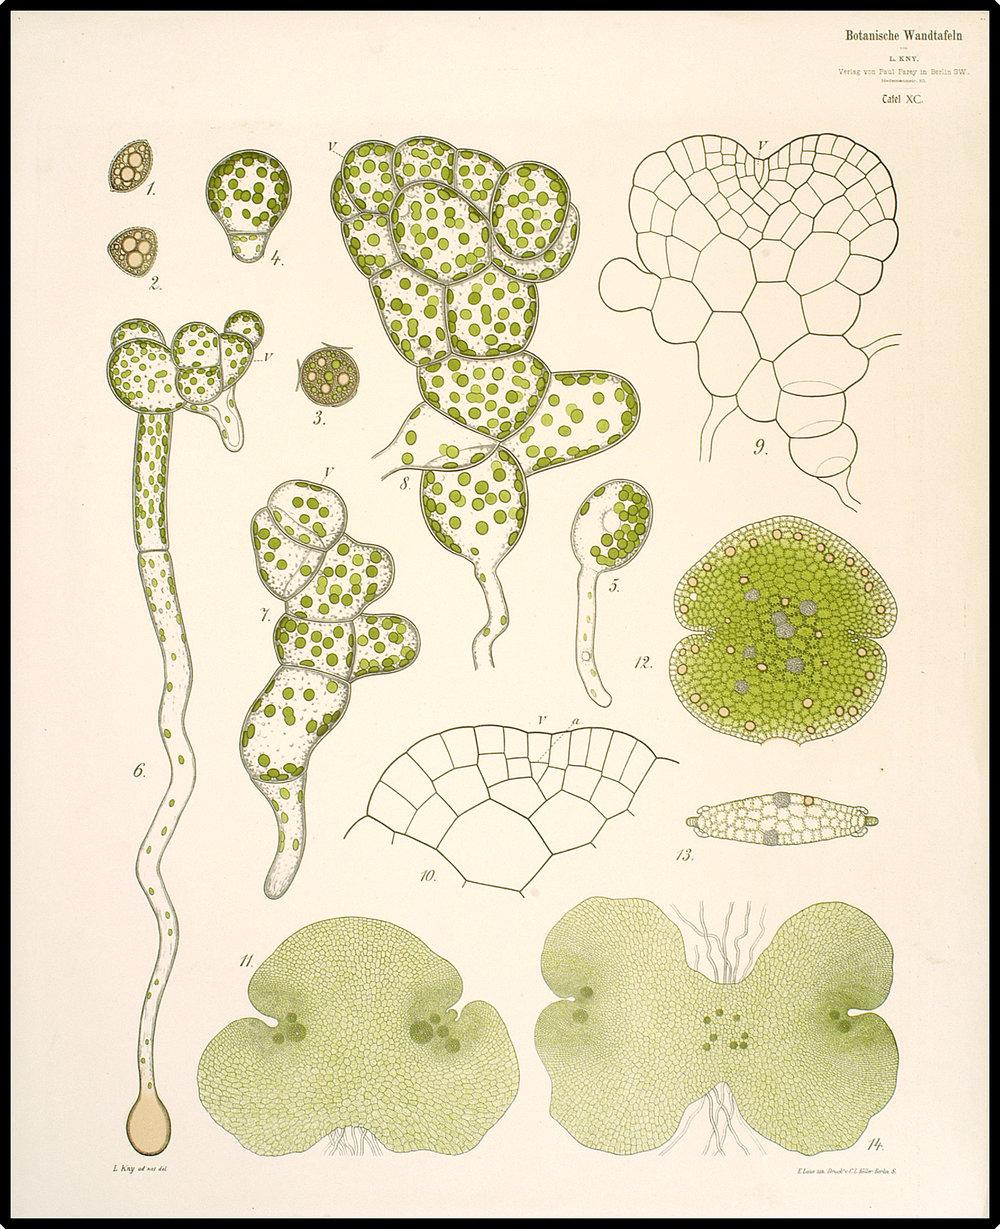 Spore germination and gemma